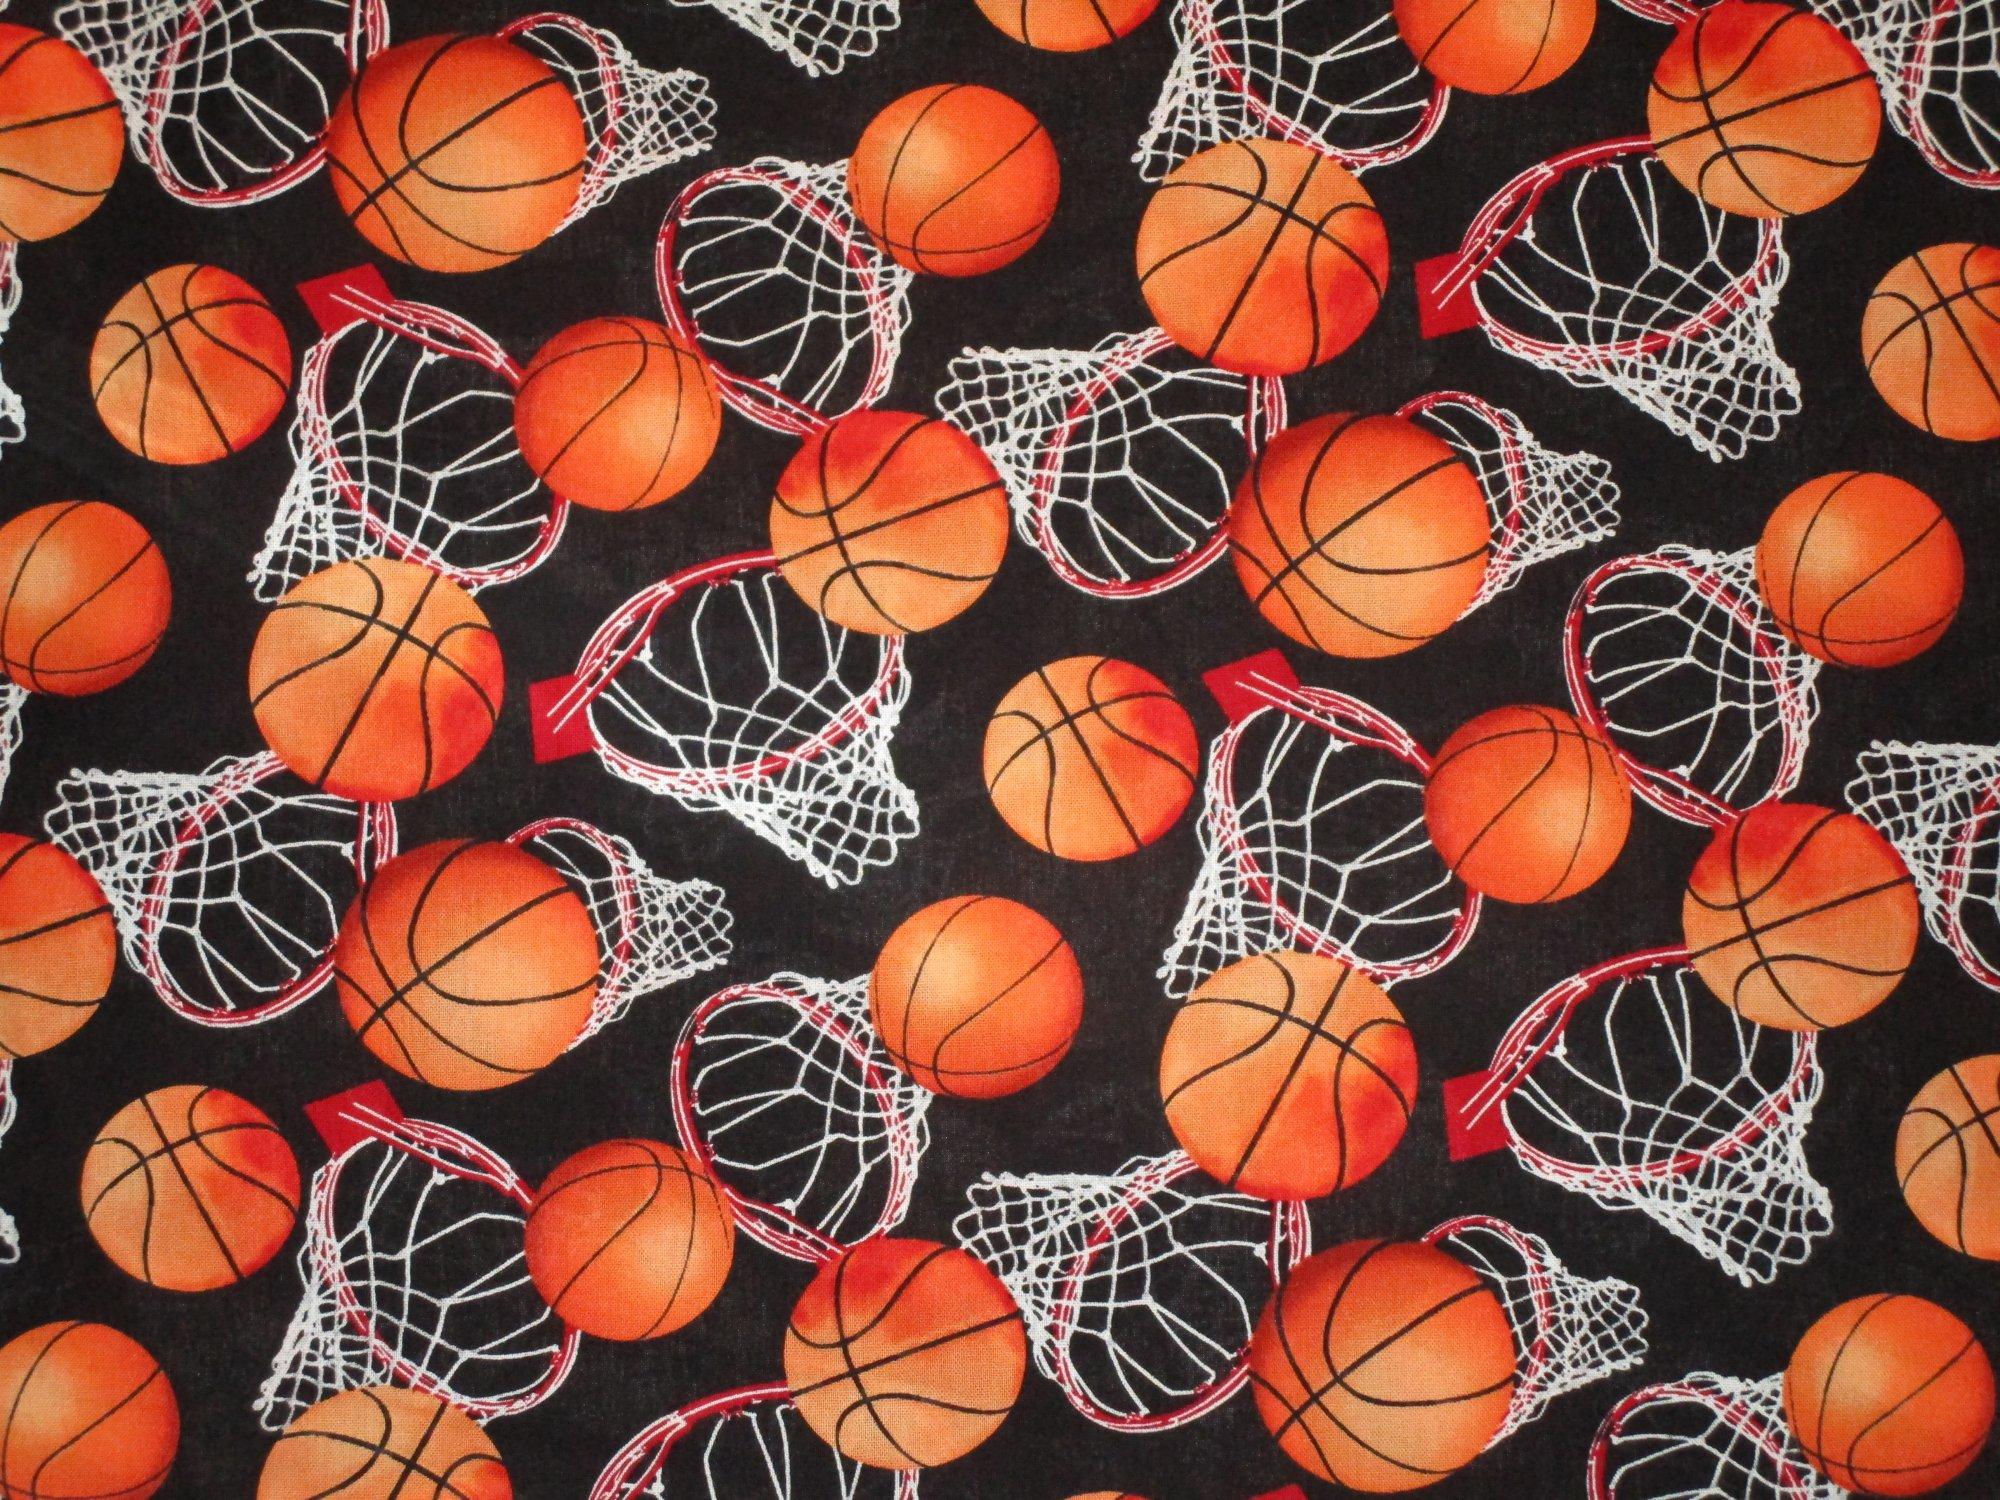 Basketball Hoops C5862 Black